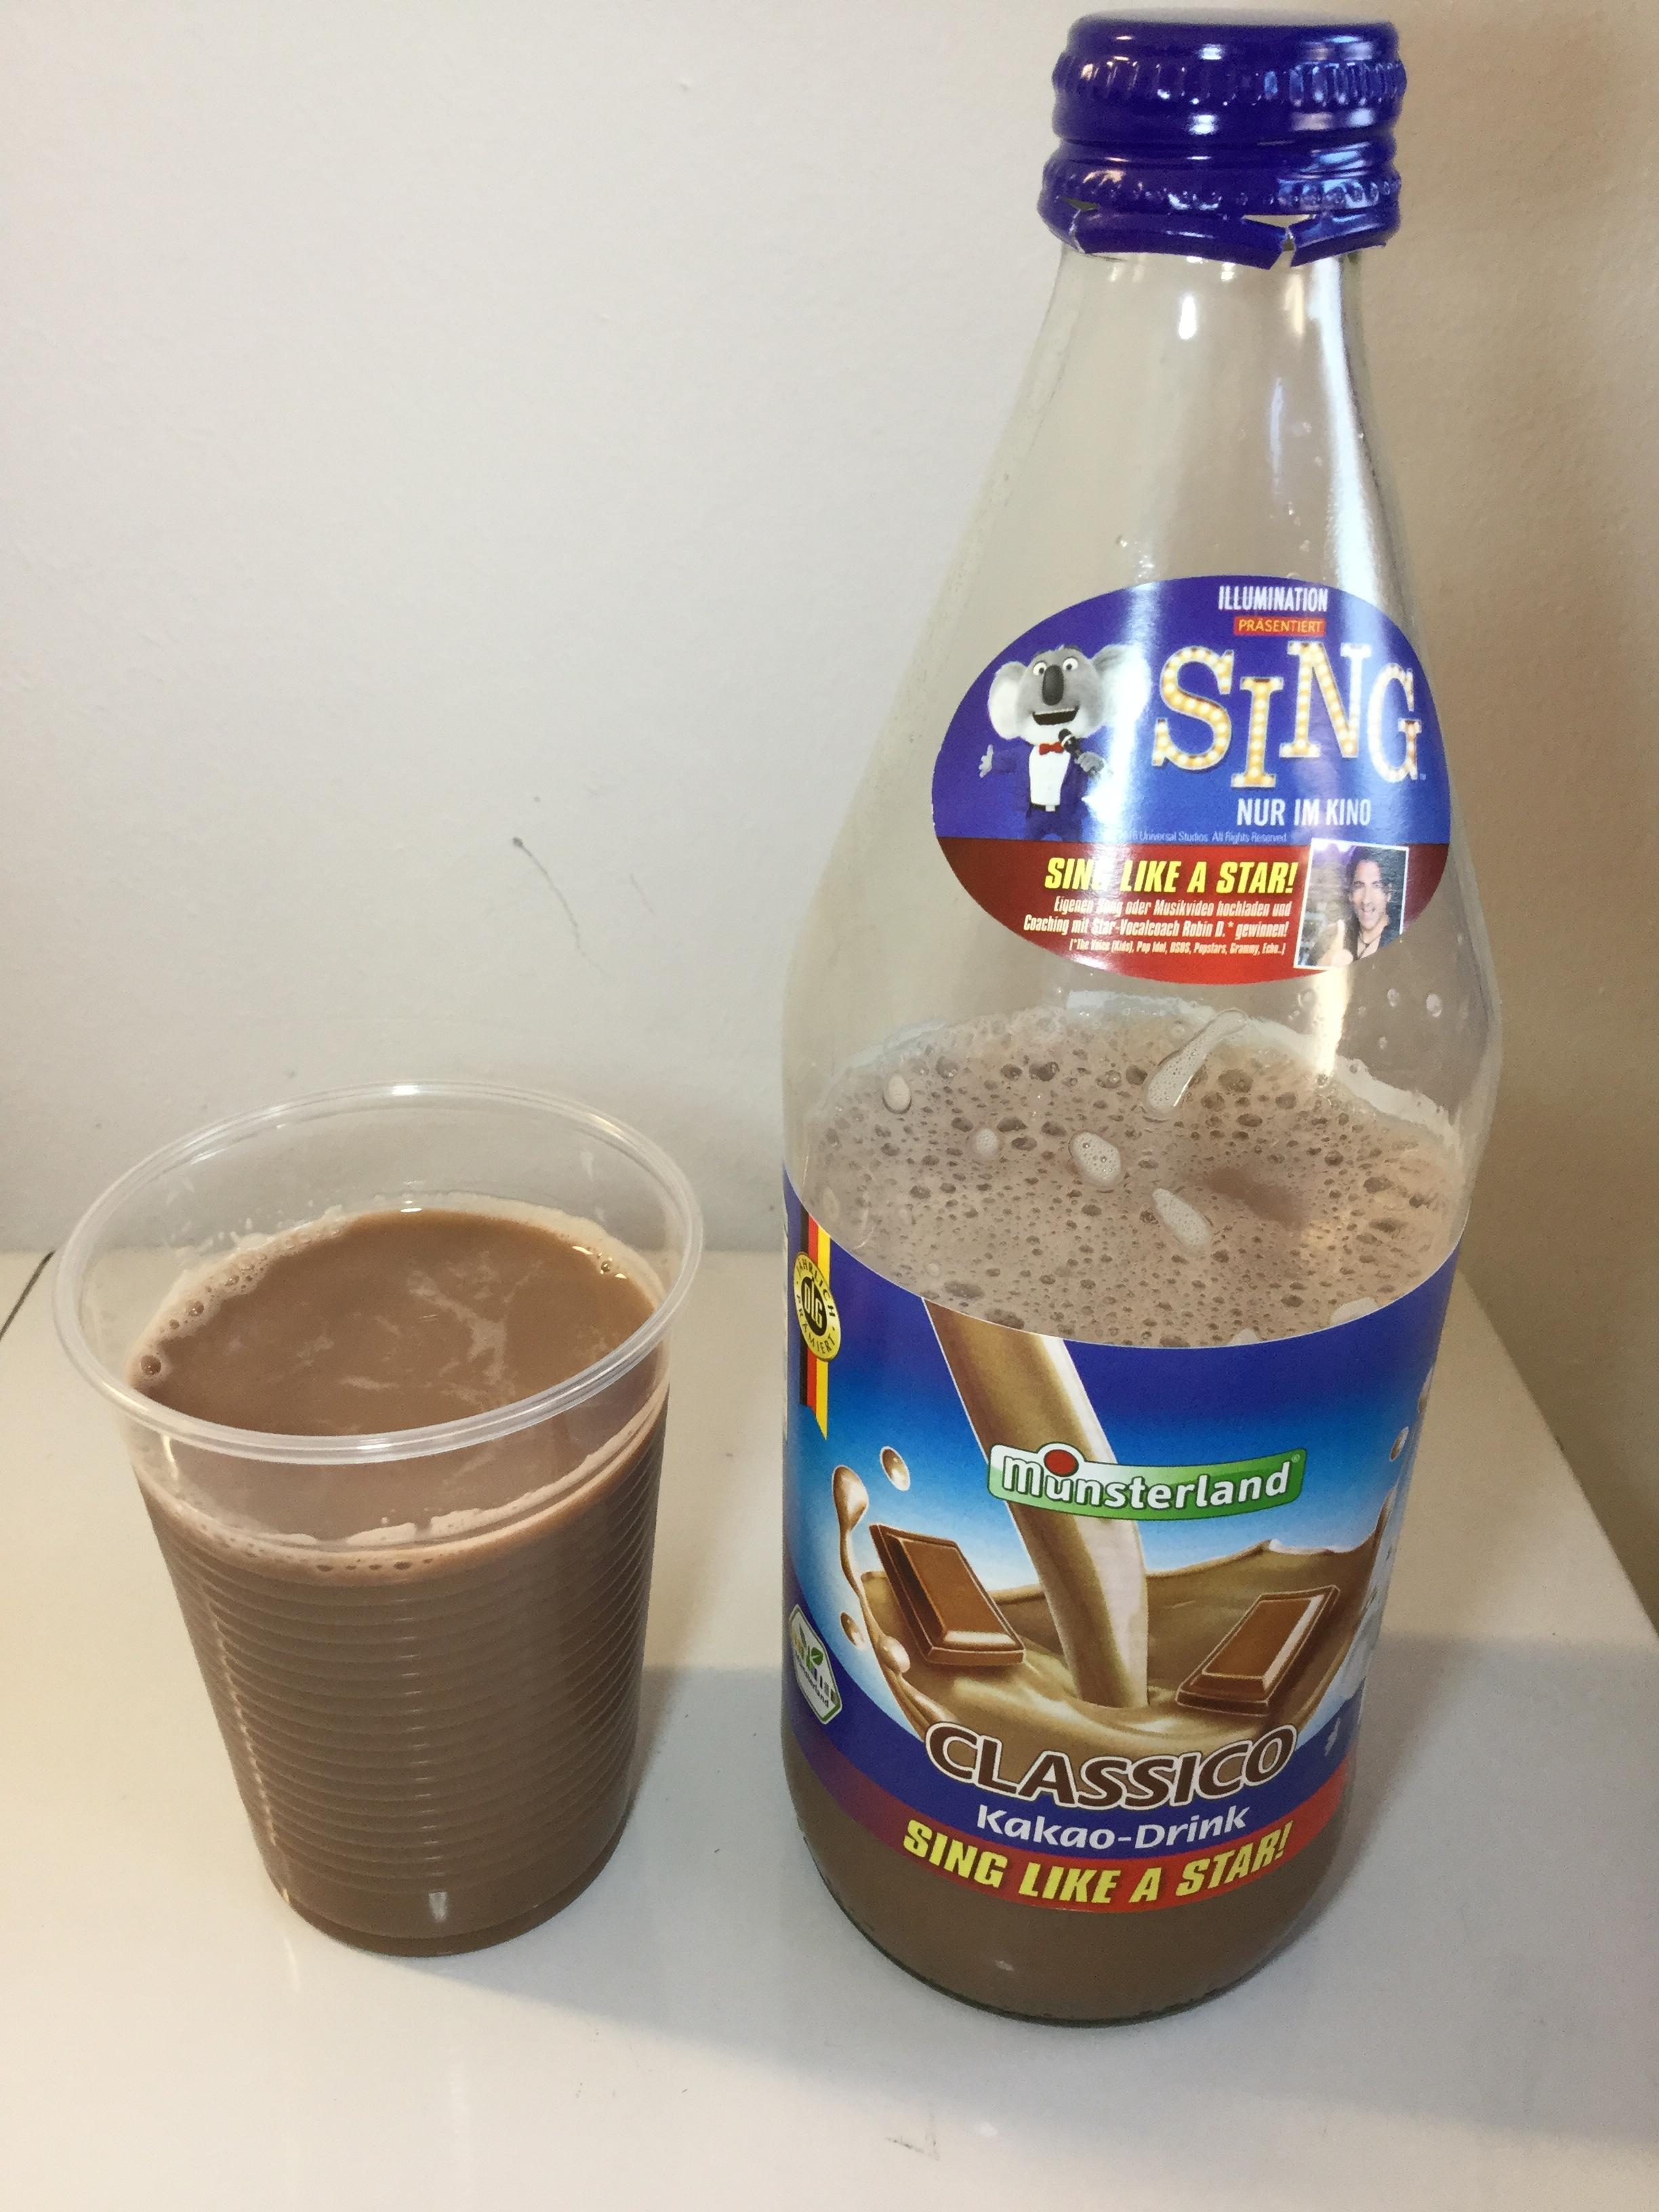 Münsterland Classico Kakao-Drink Cup